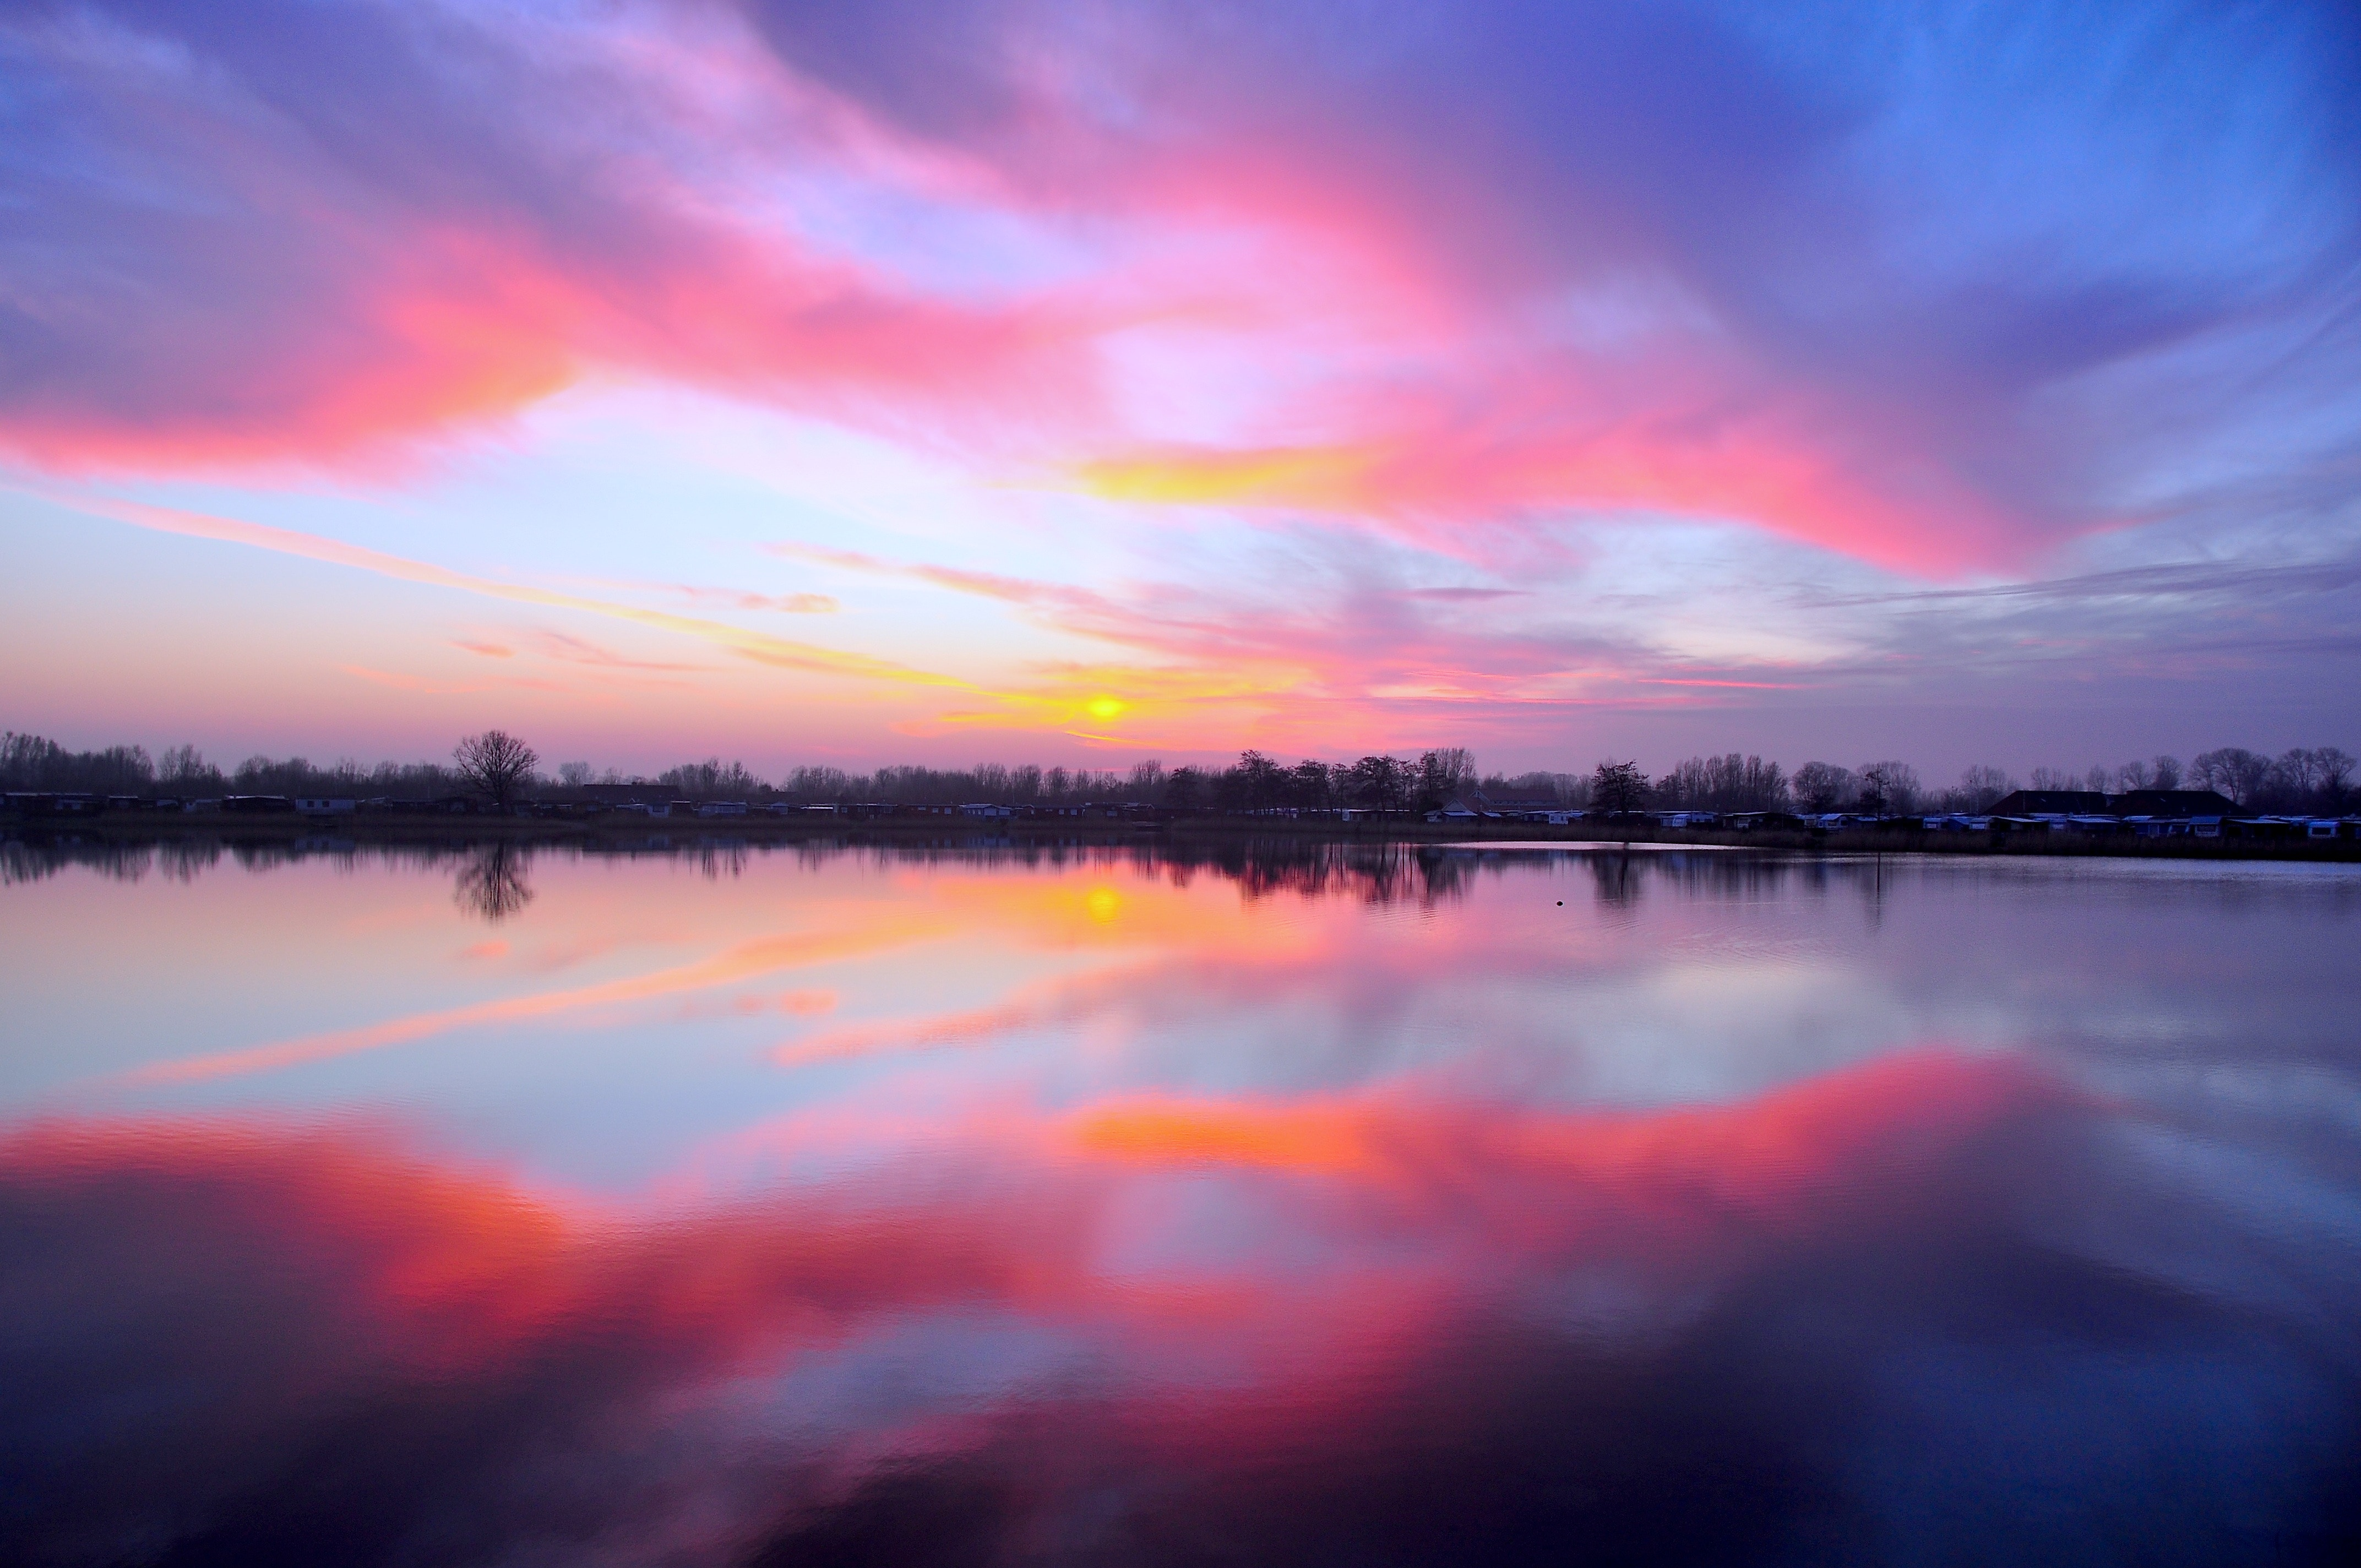 Cuxhaven Beautiful Sunrise iPhone Wallpaper - iDrop News